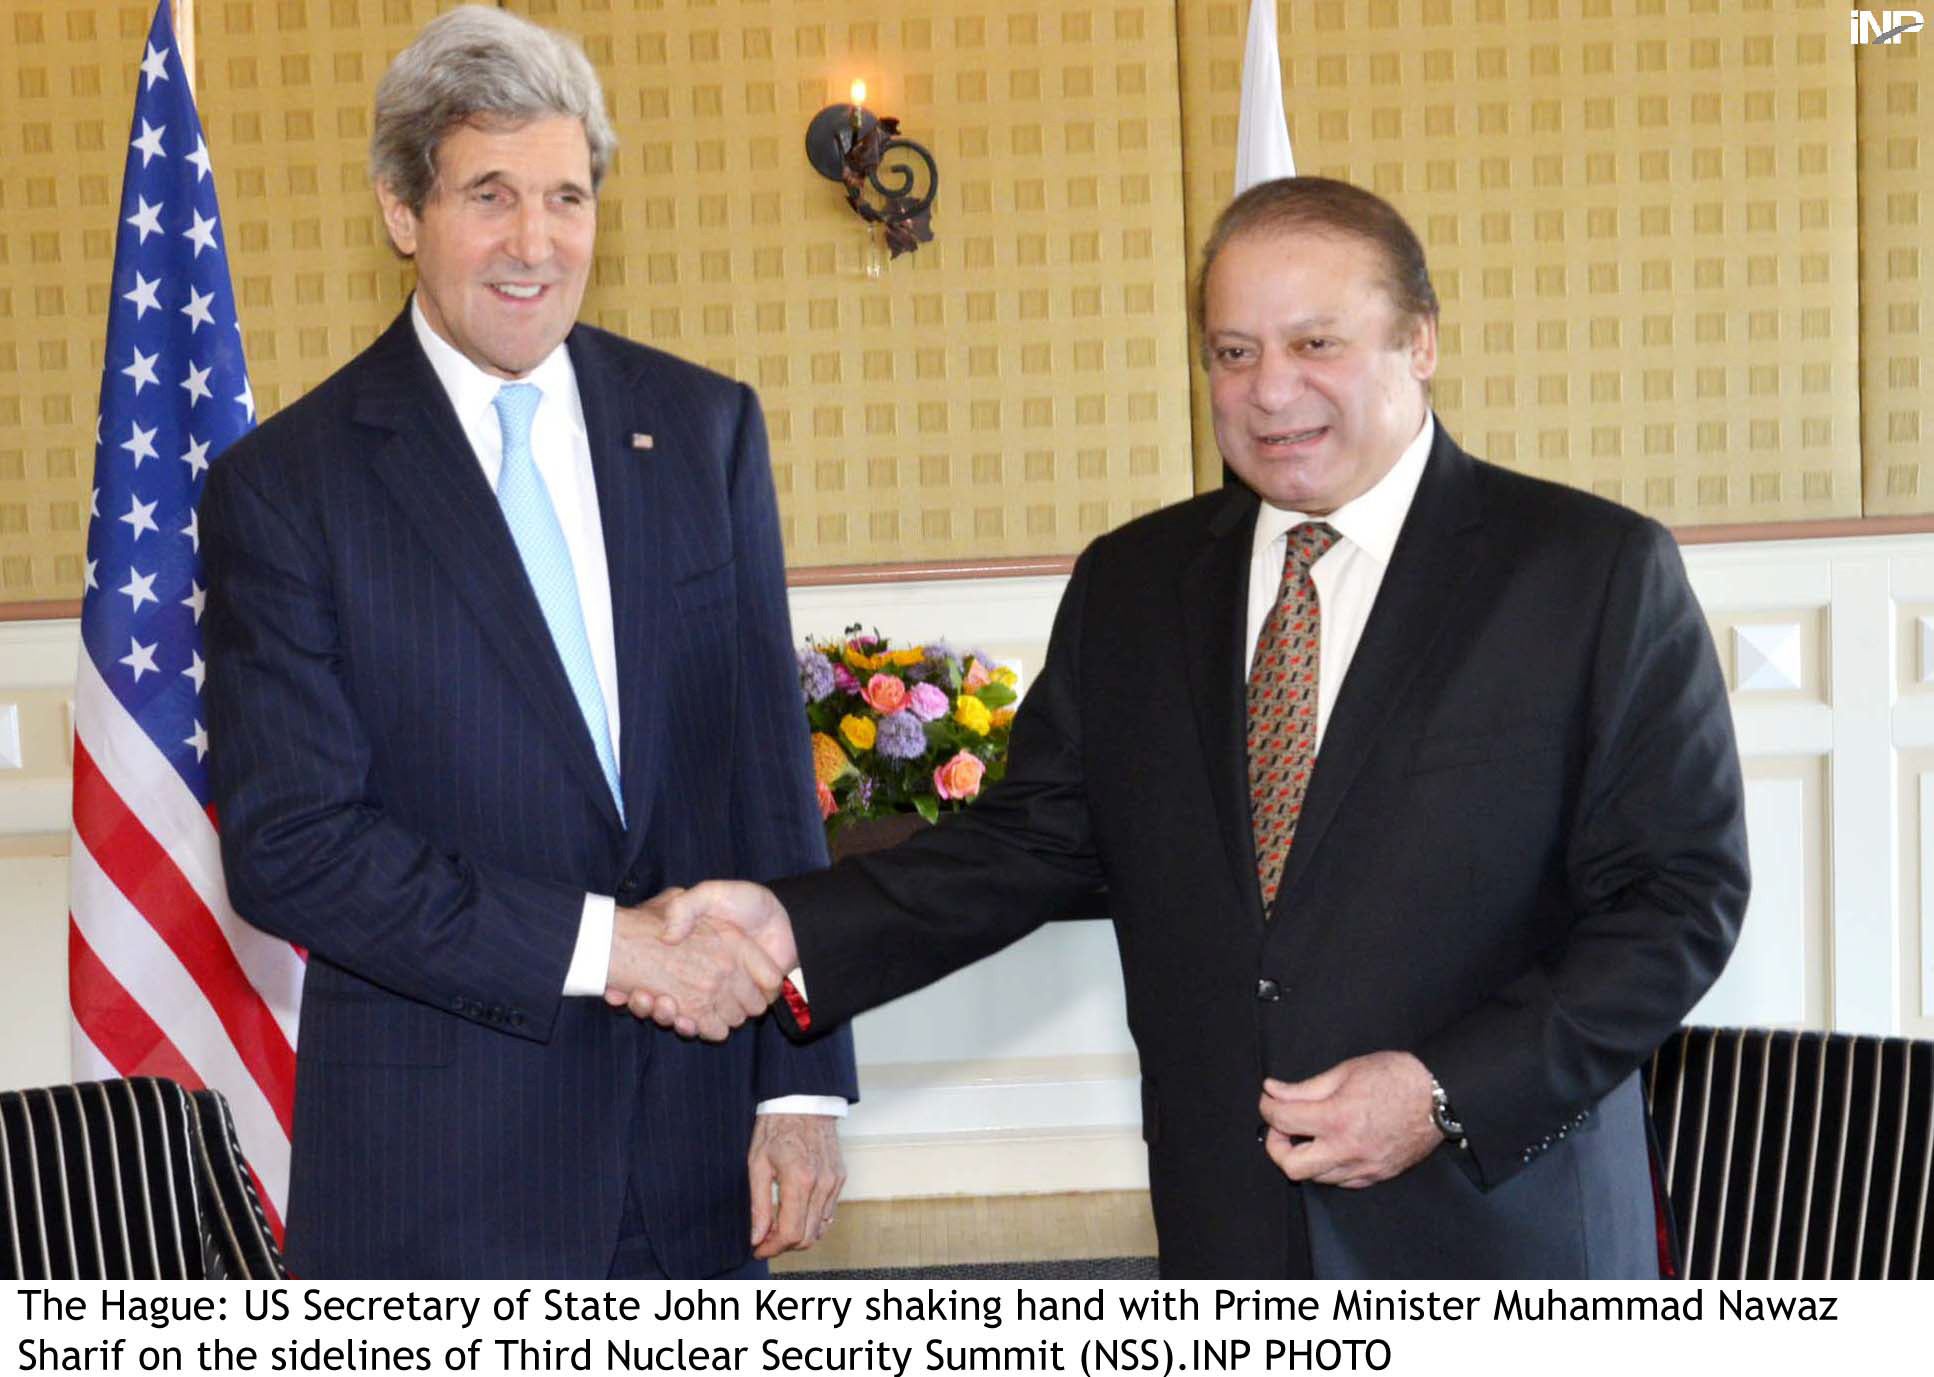 us secretary of state john kerry shakes hands with pm nawaz sharif photo inp